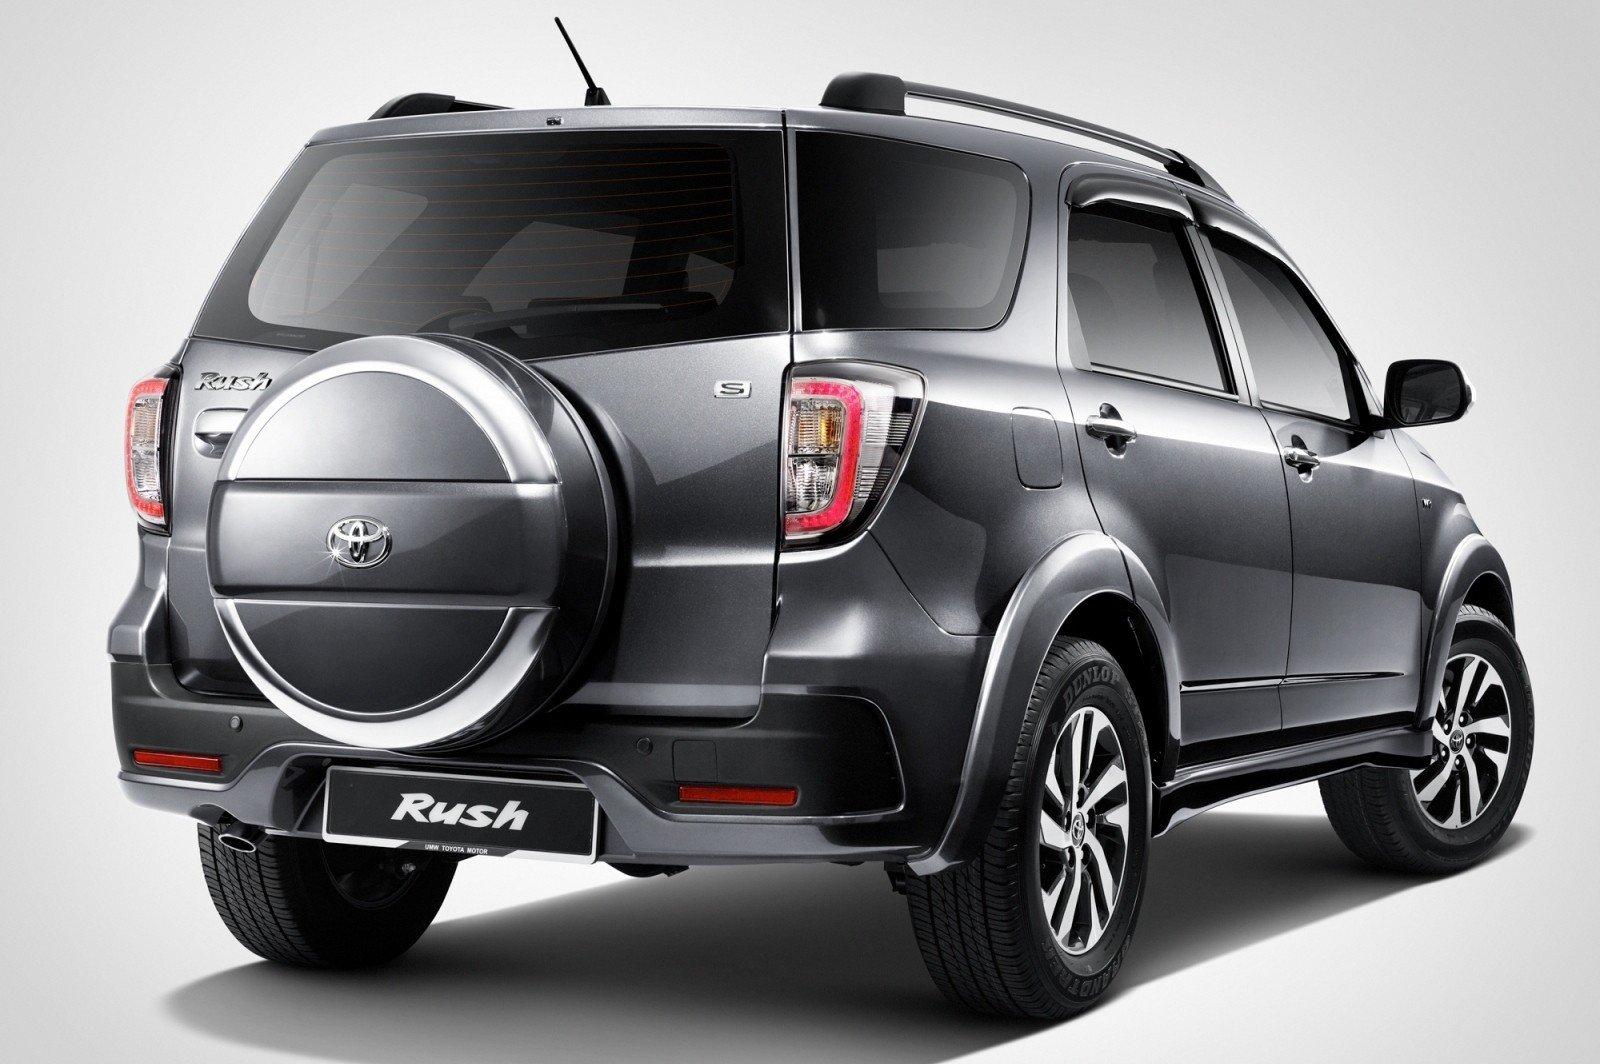 Daihatsu Terios 2017 >> 2015 Toyota Rush facelift introduced in Malaysia Paul Tan - Image 332374